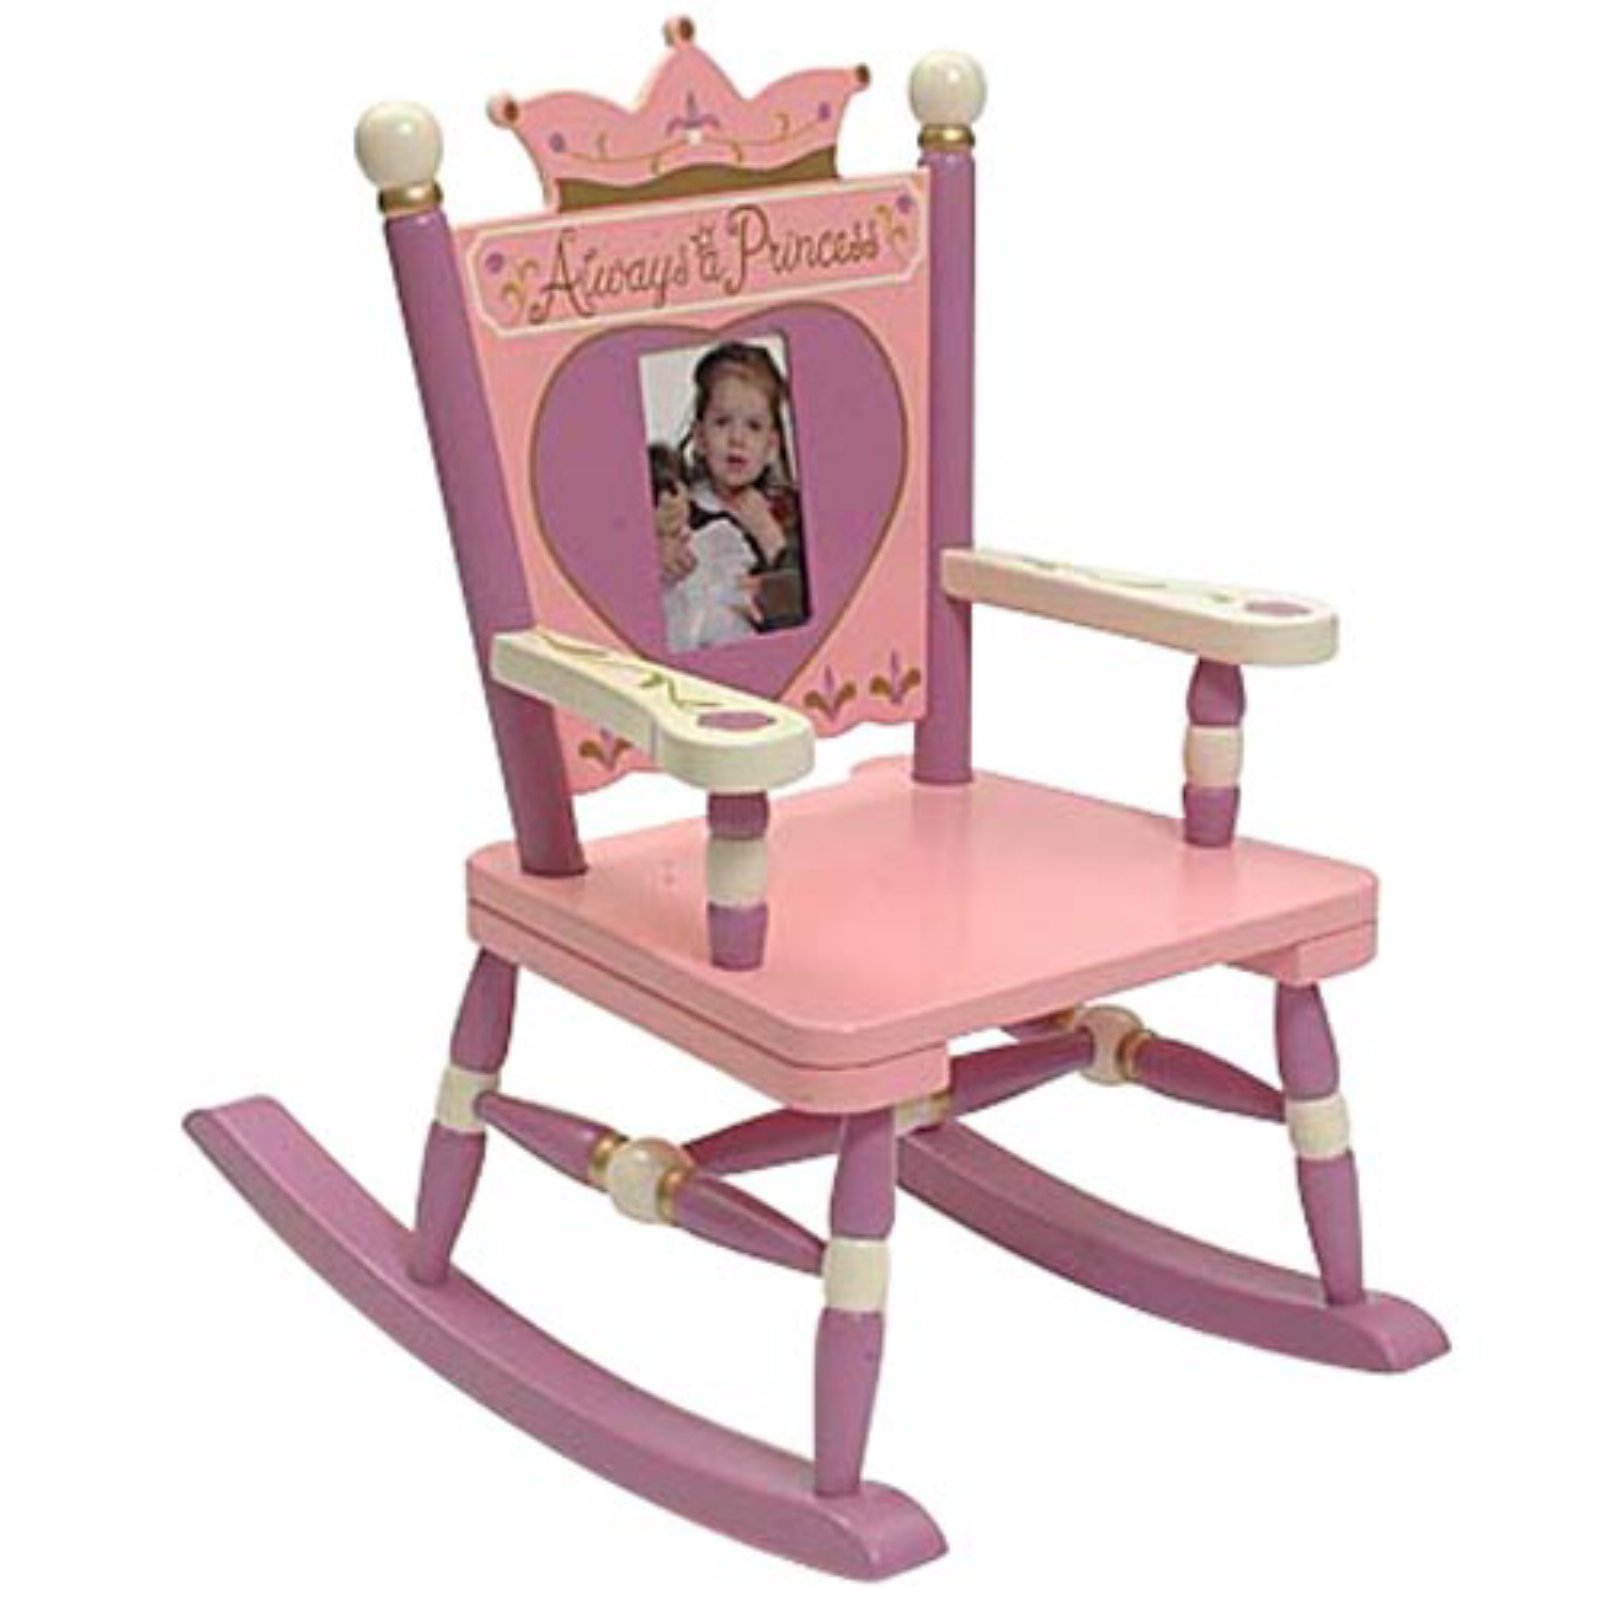 Wildkin Princess Mini Rocking Chair by Wildkin